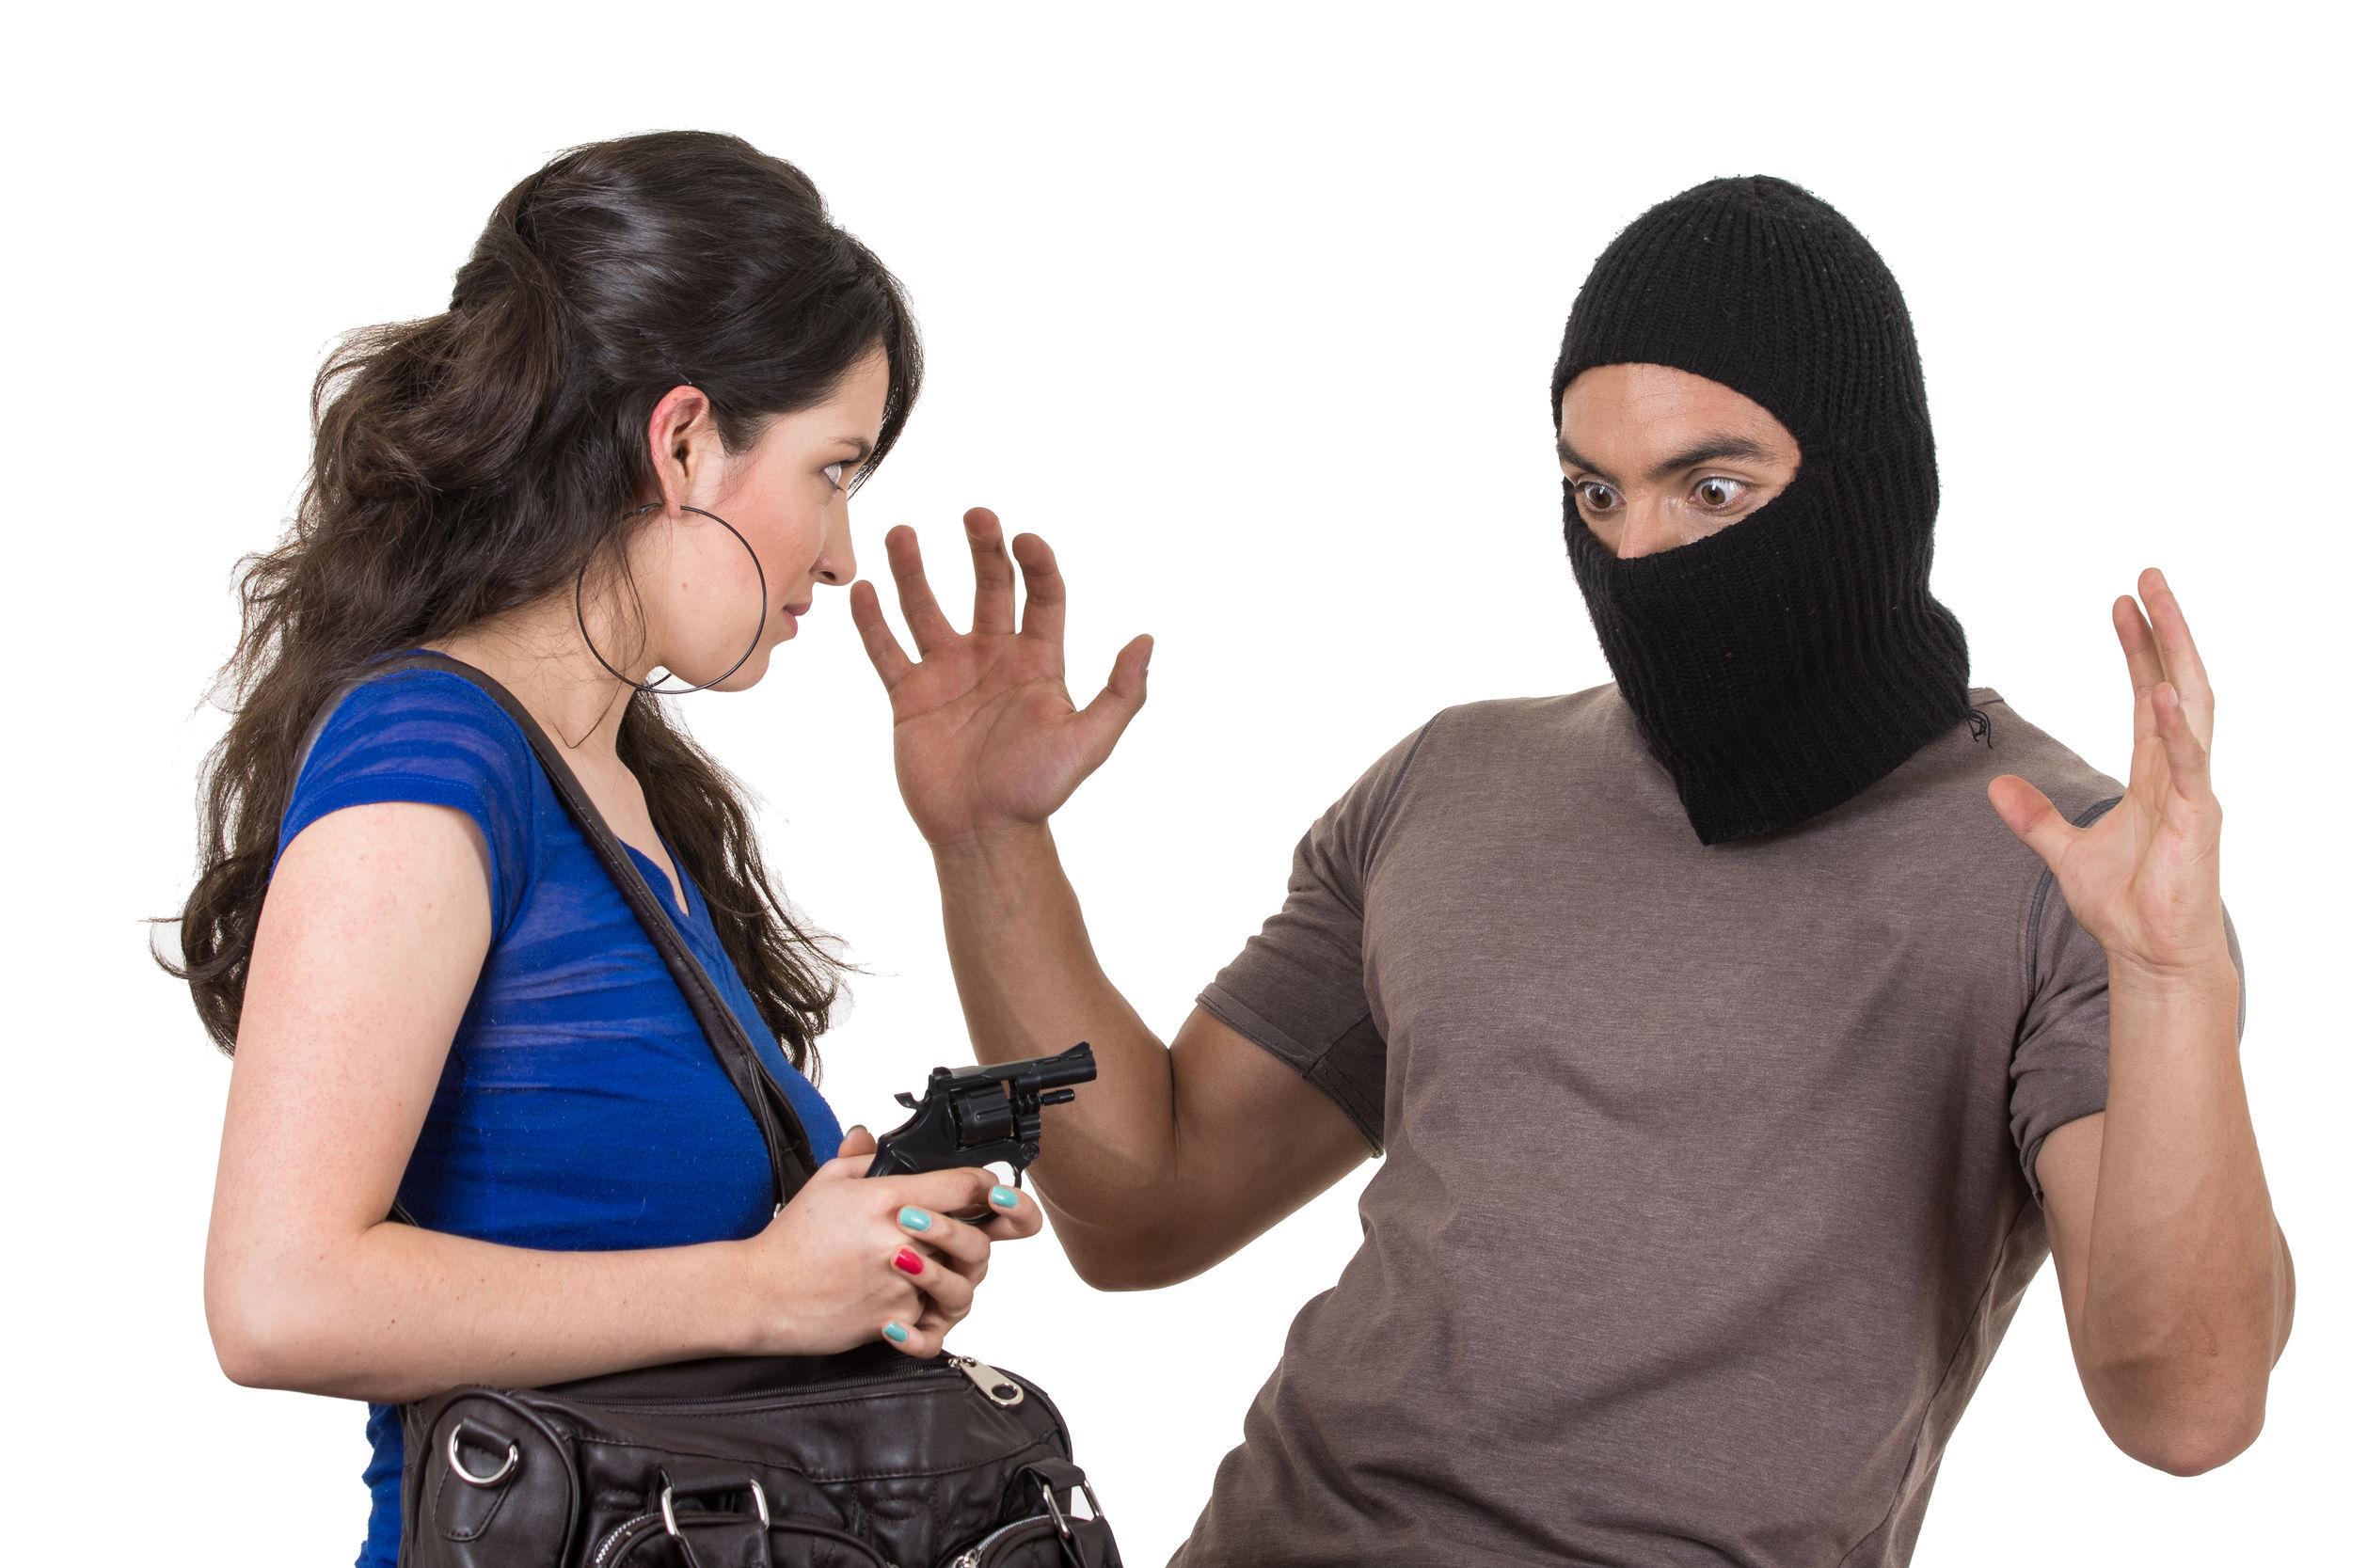 Handguns for women self defense